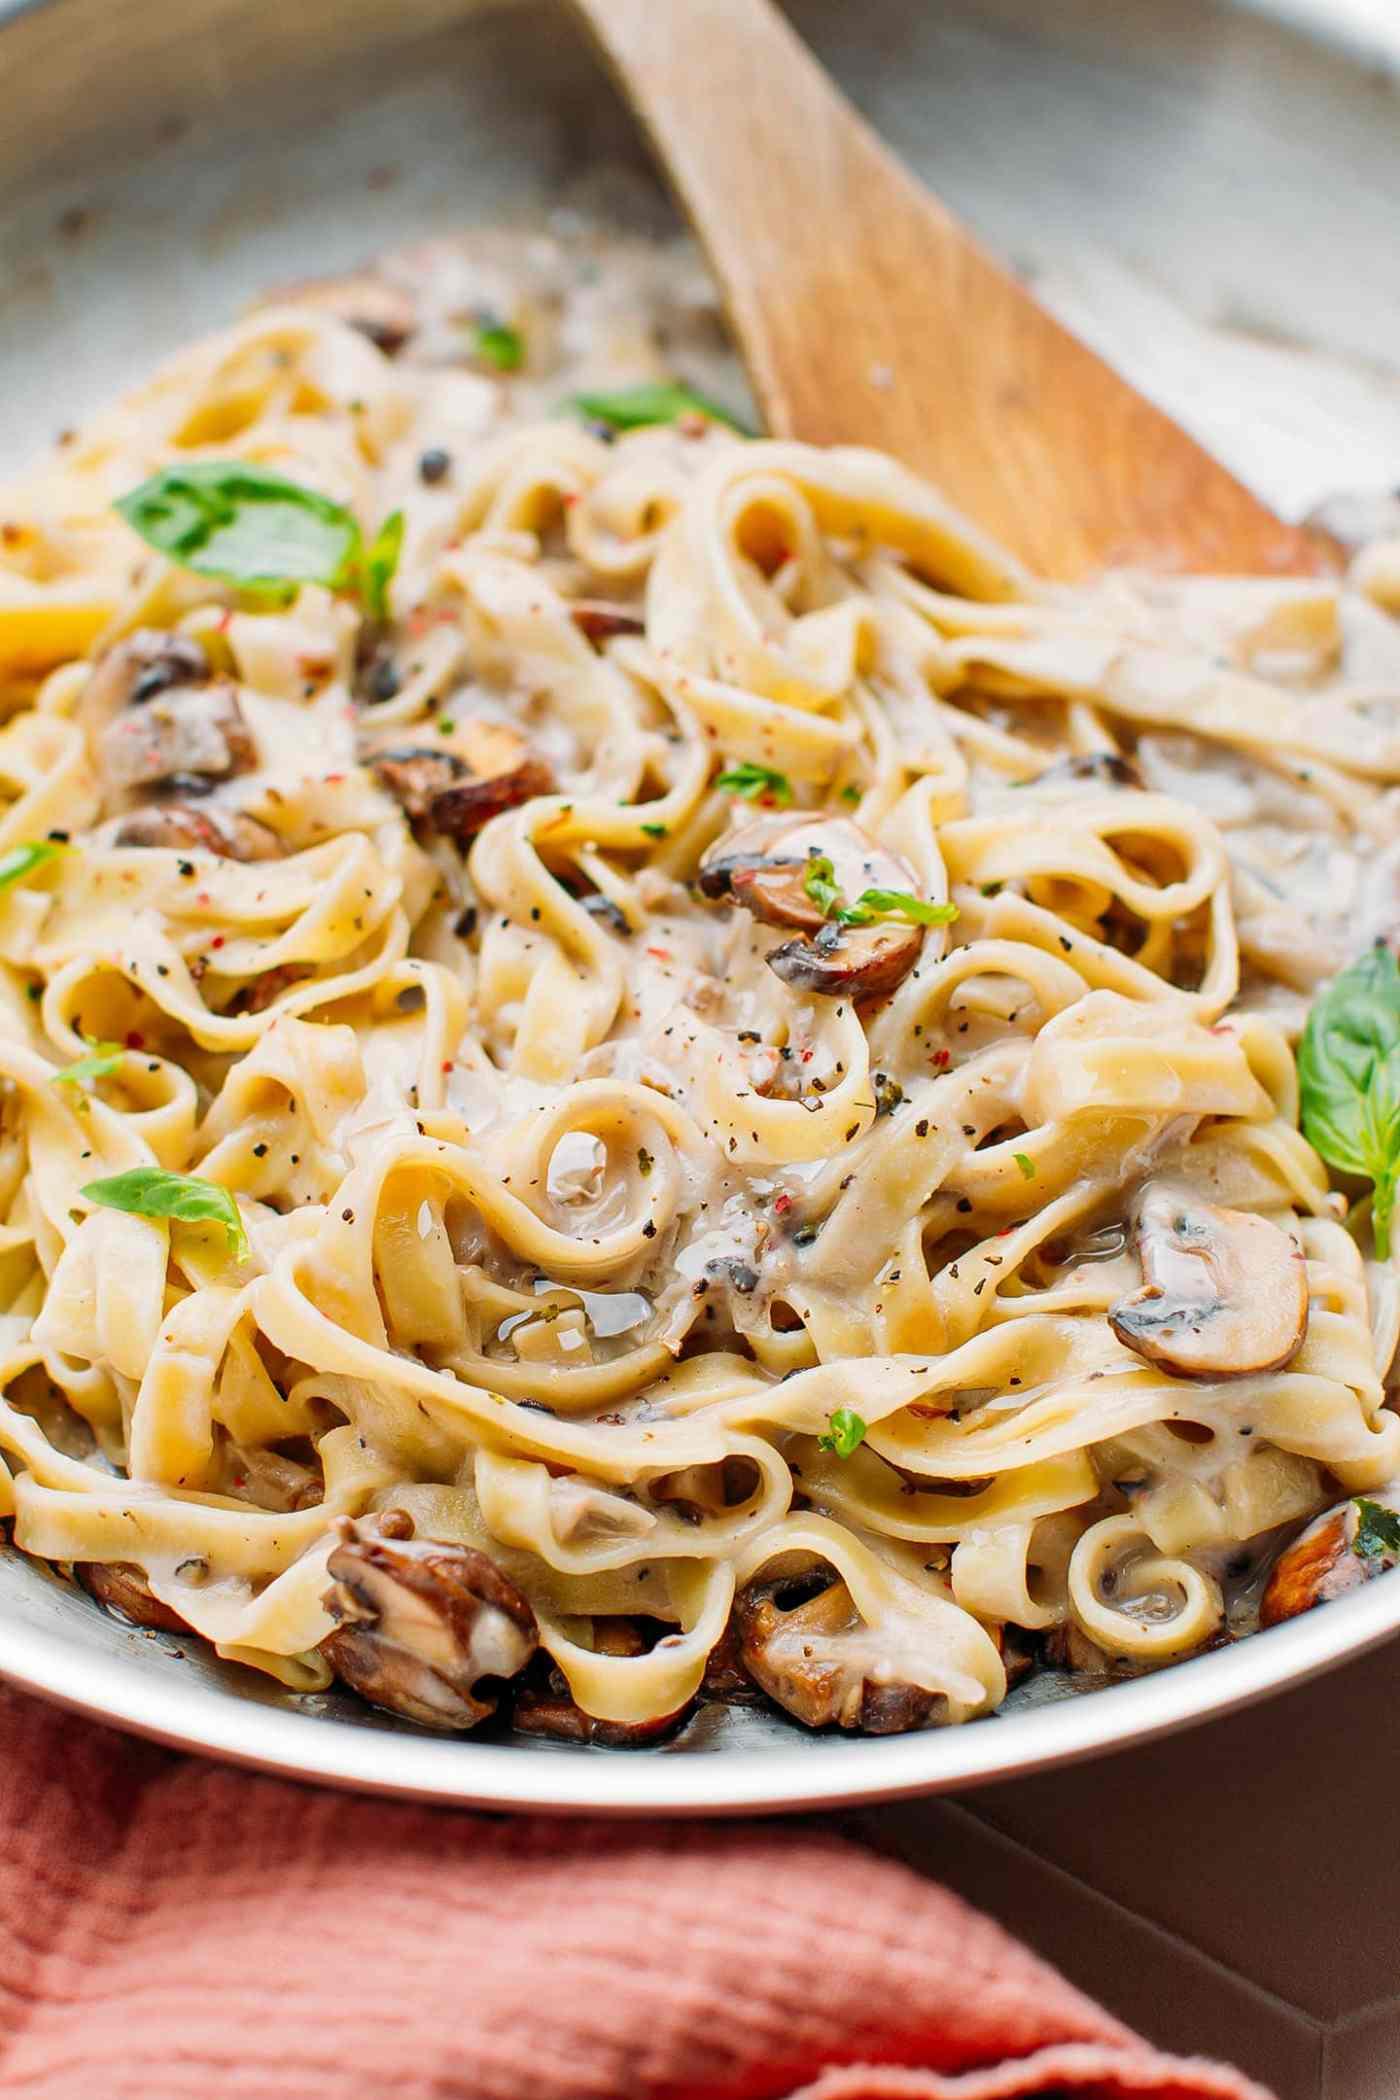 Easy Vegan Mushroom Pasta with Peppercorn Sauce